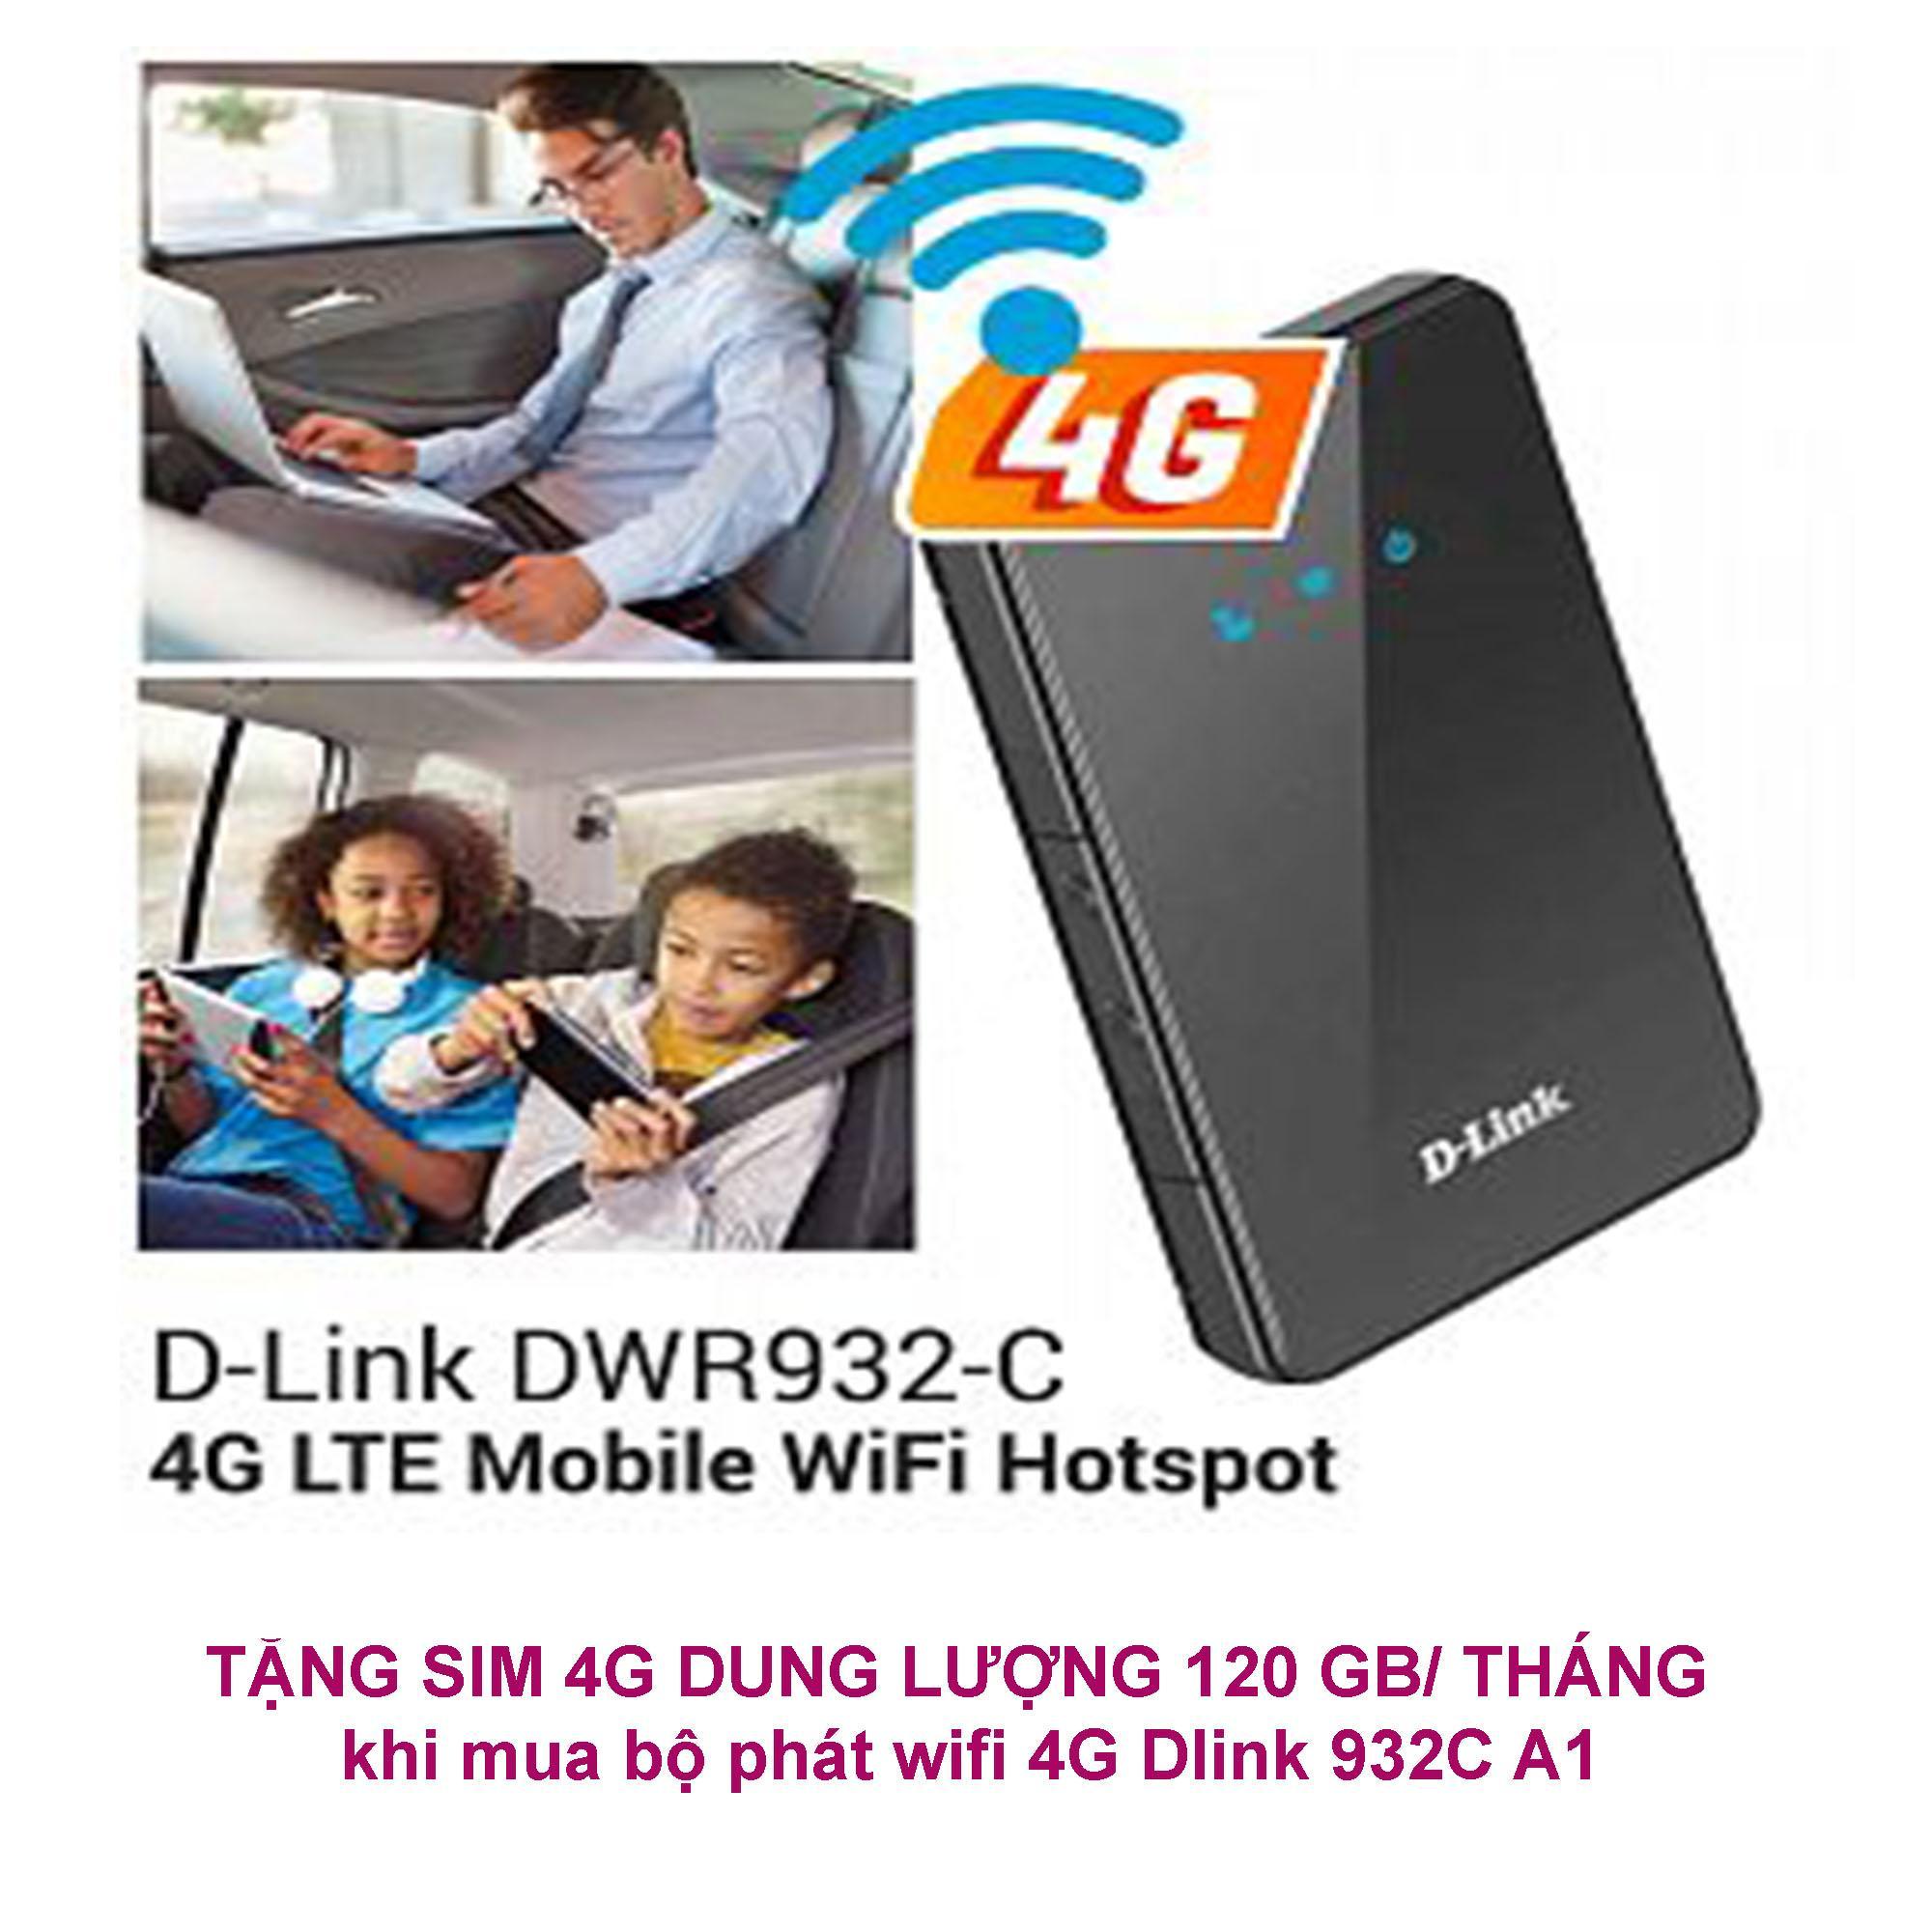 Giá Bộ phát wifi 4G D-link 932C A1, Wifi Dlink, Wifi 4G Dlink, Wifi 4G Lte D-link 932C A1, wifi 4G router D-link 932C A1, 4G wifi D-link 932C A1, 4G wifi Hotpot D-link 932C, wifi 4G tặng sim, cục phát wifi 4G – MobiShop